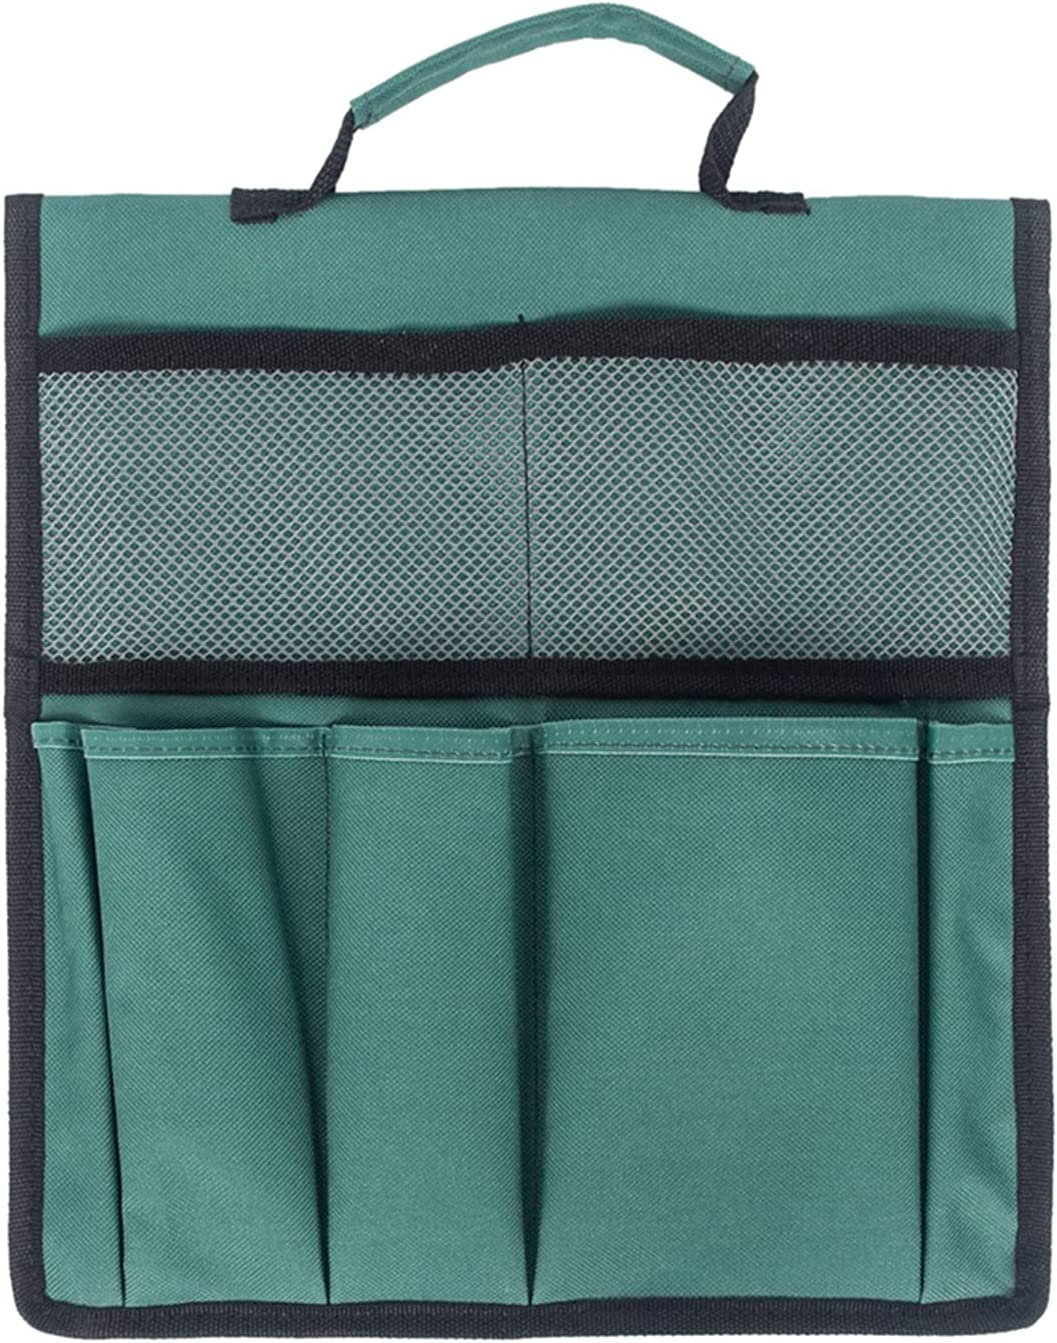 STOYRB Garden Tool Bag Oxford Portable Save money C Kneeler Great interest